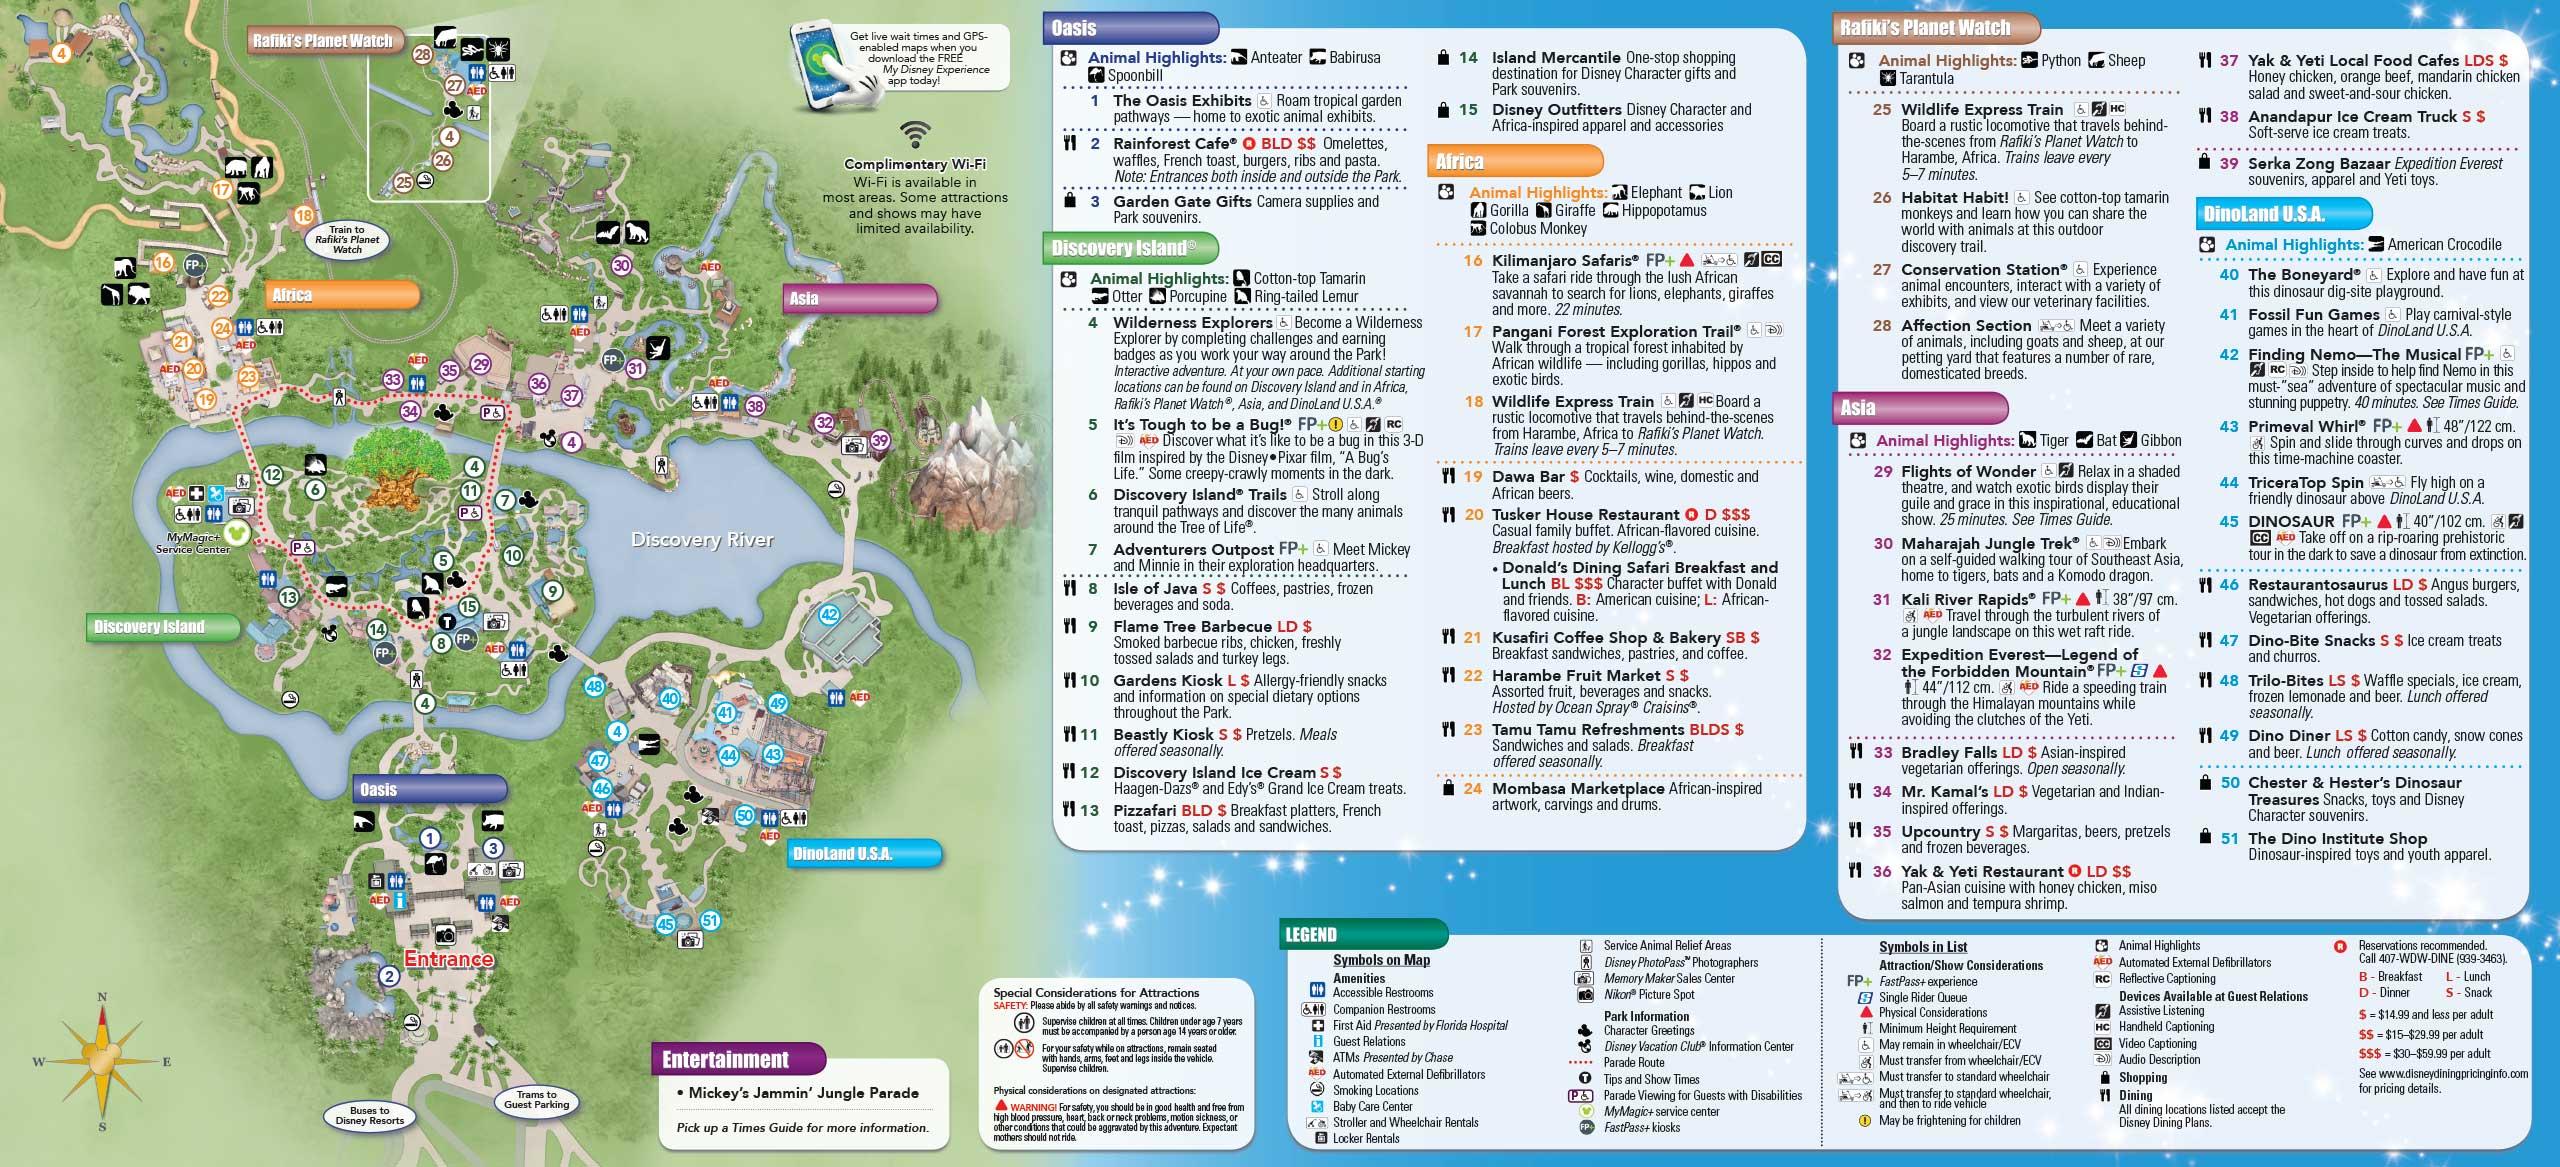 2014 Walt Disney World Park Maps with FastPass+ - Photo 2 of 8